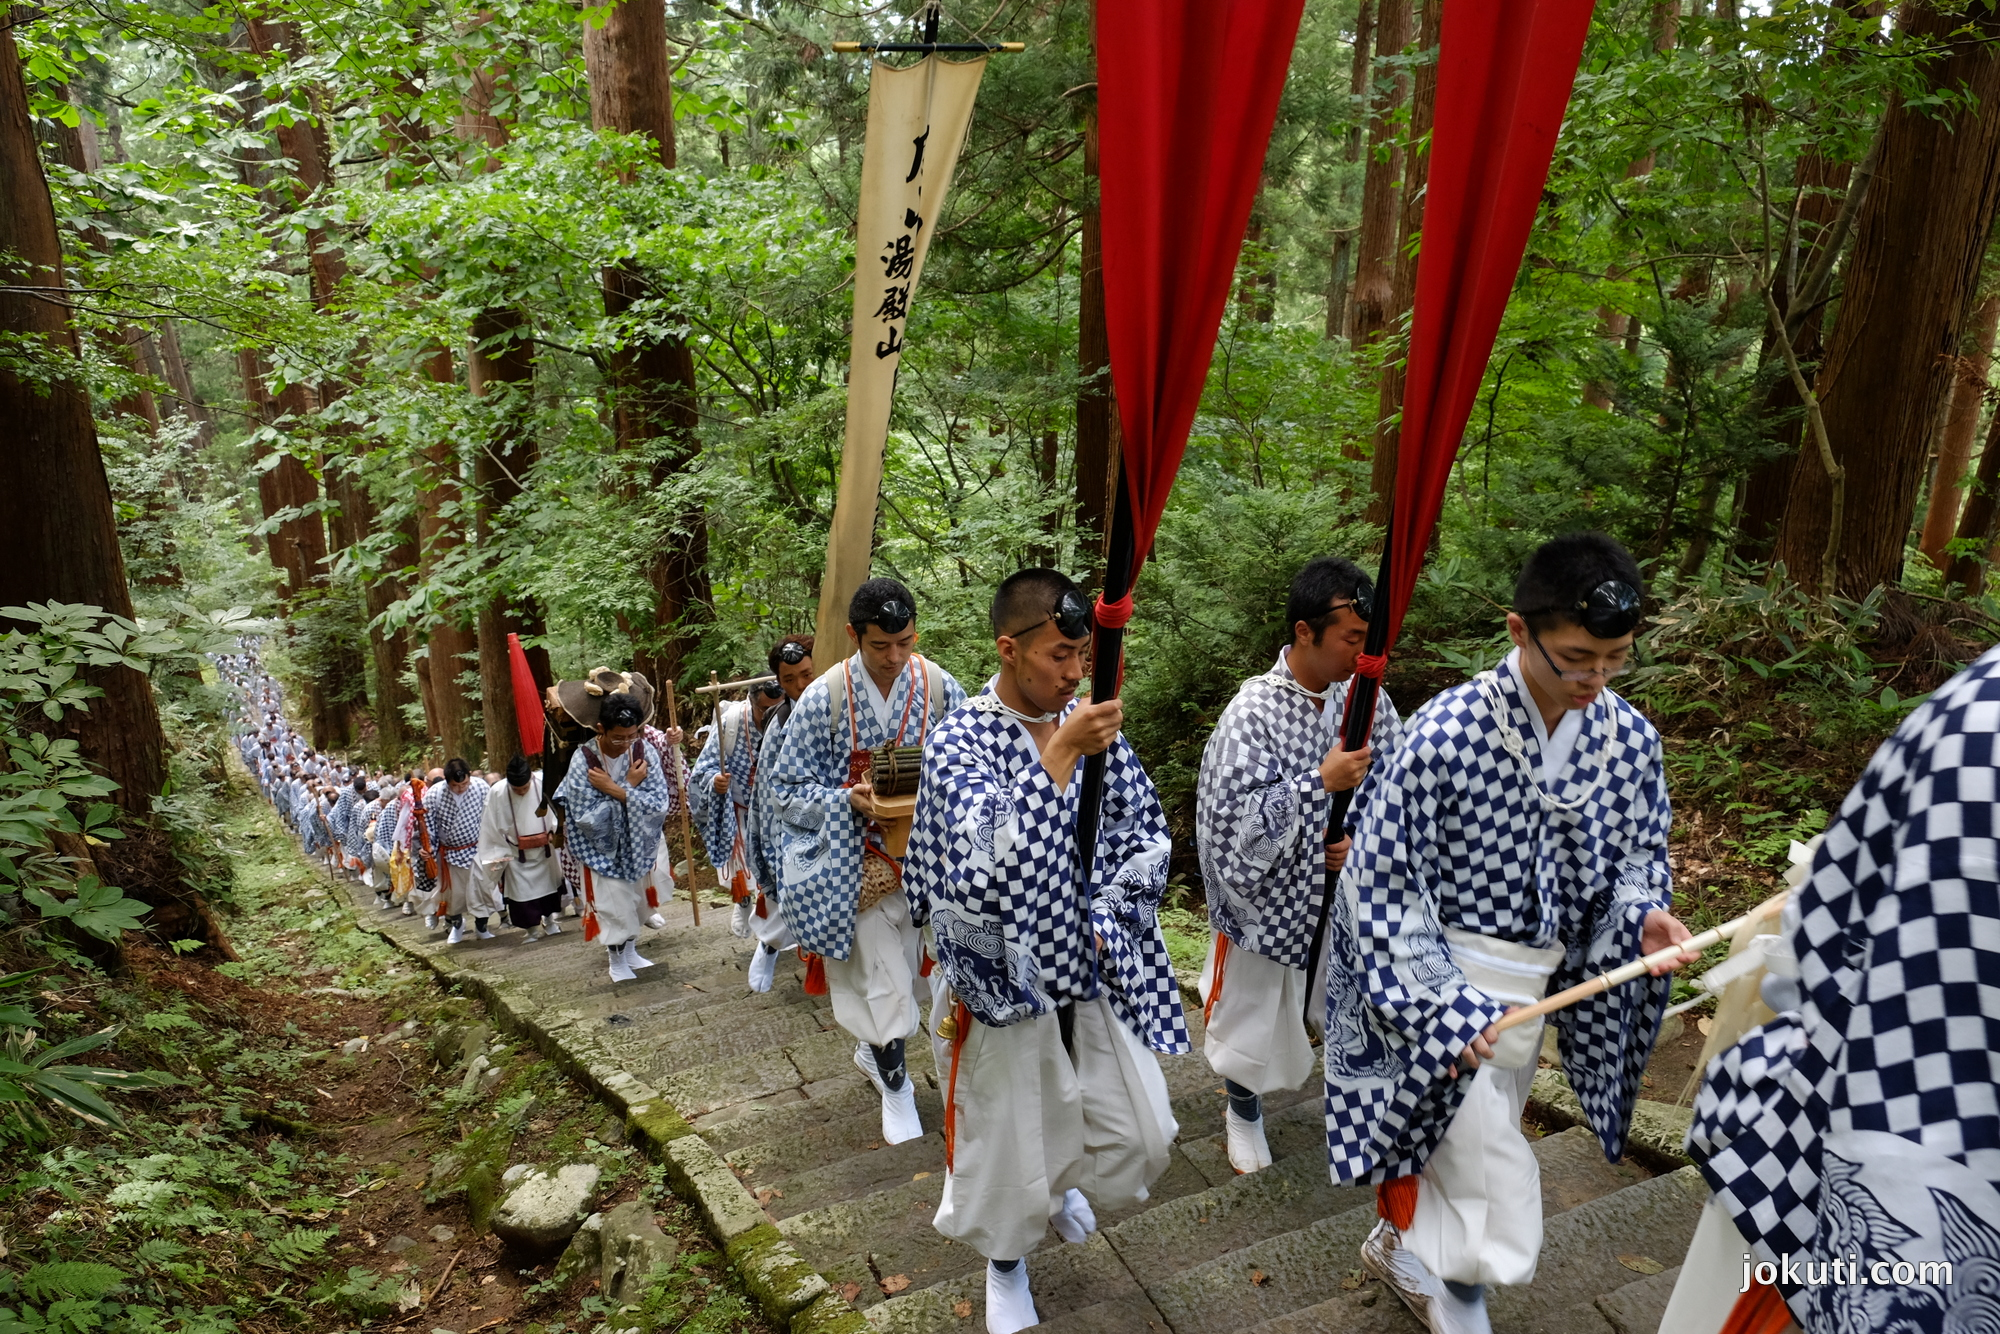 yamabushi_japan_shinto_pilgrimage_tsuruoka_yamagata_haguro_priests_jokuti_1777.JPG